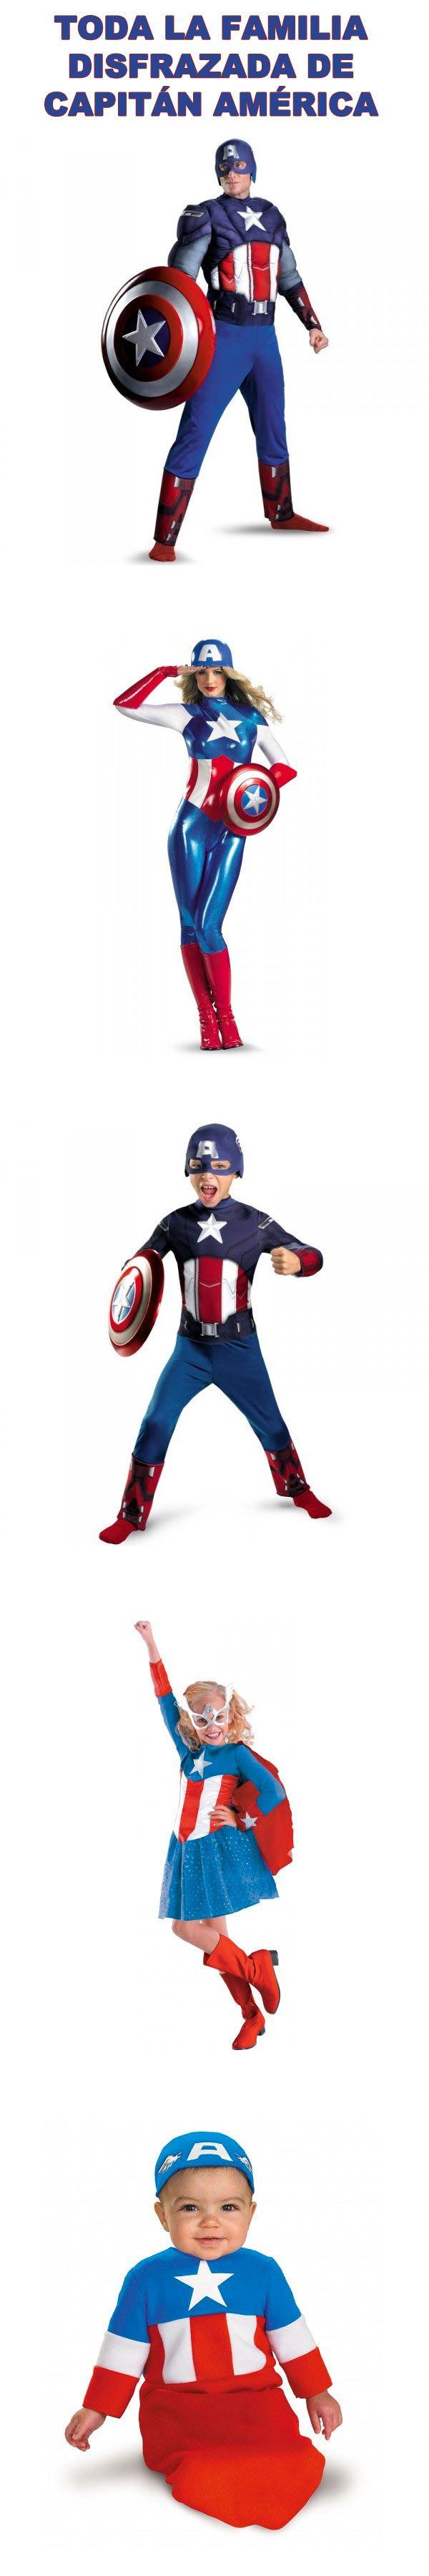 Toda la familia Capitán América